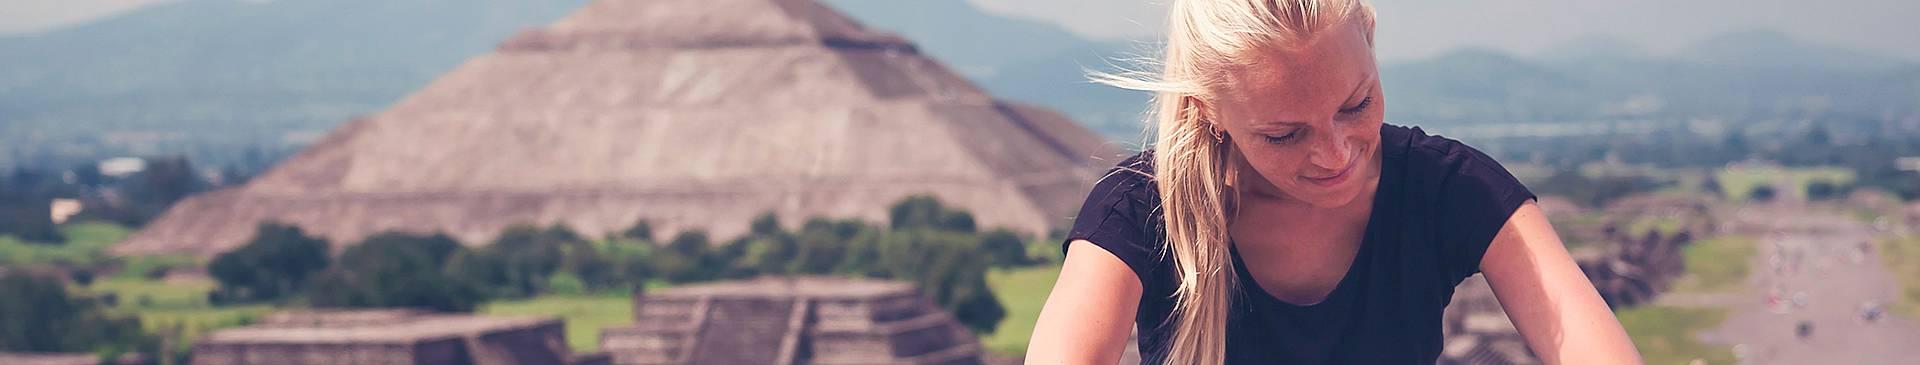 Trekking in Messico